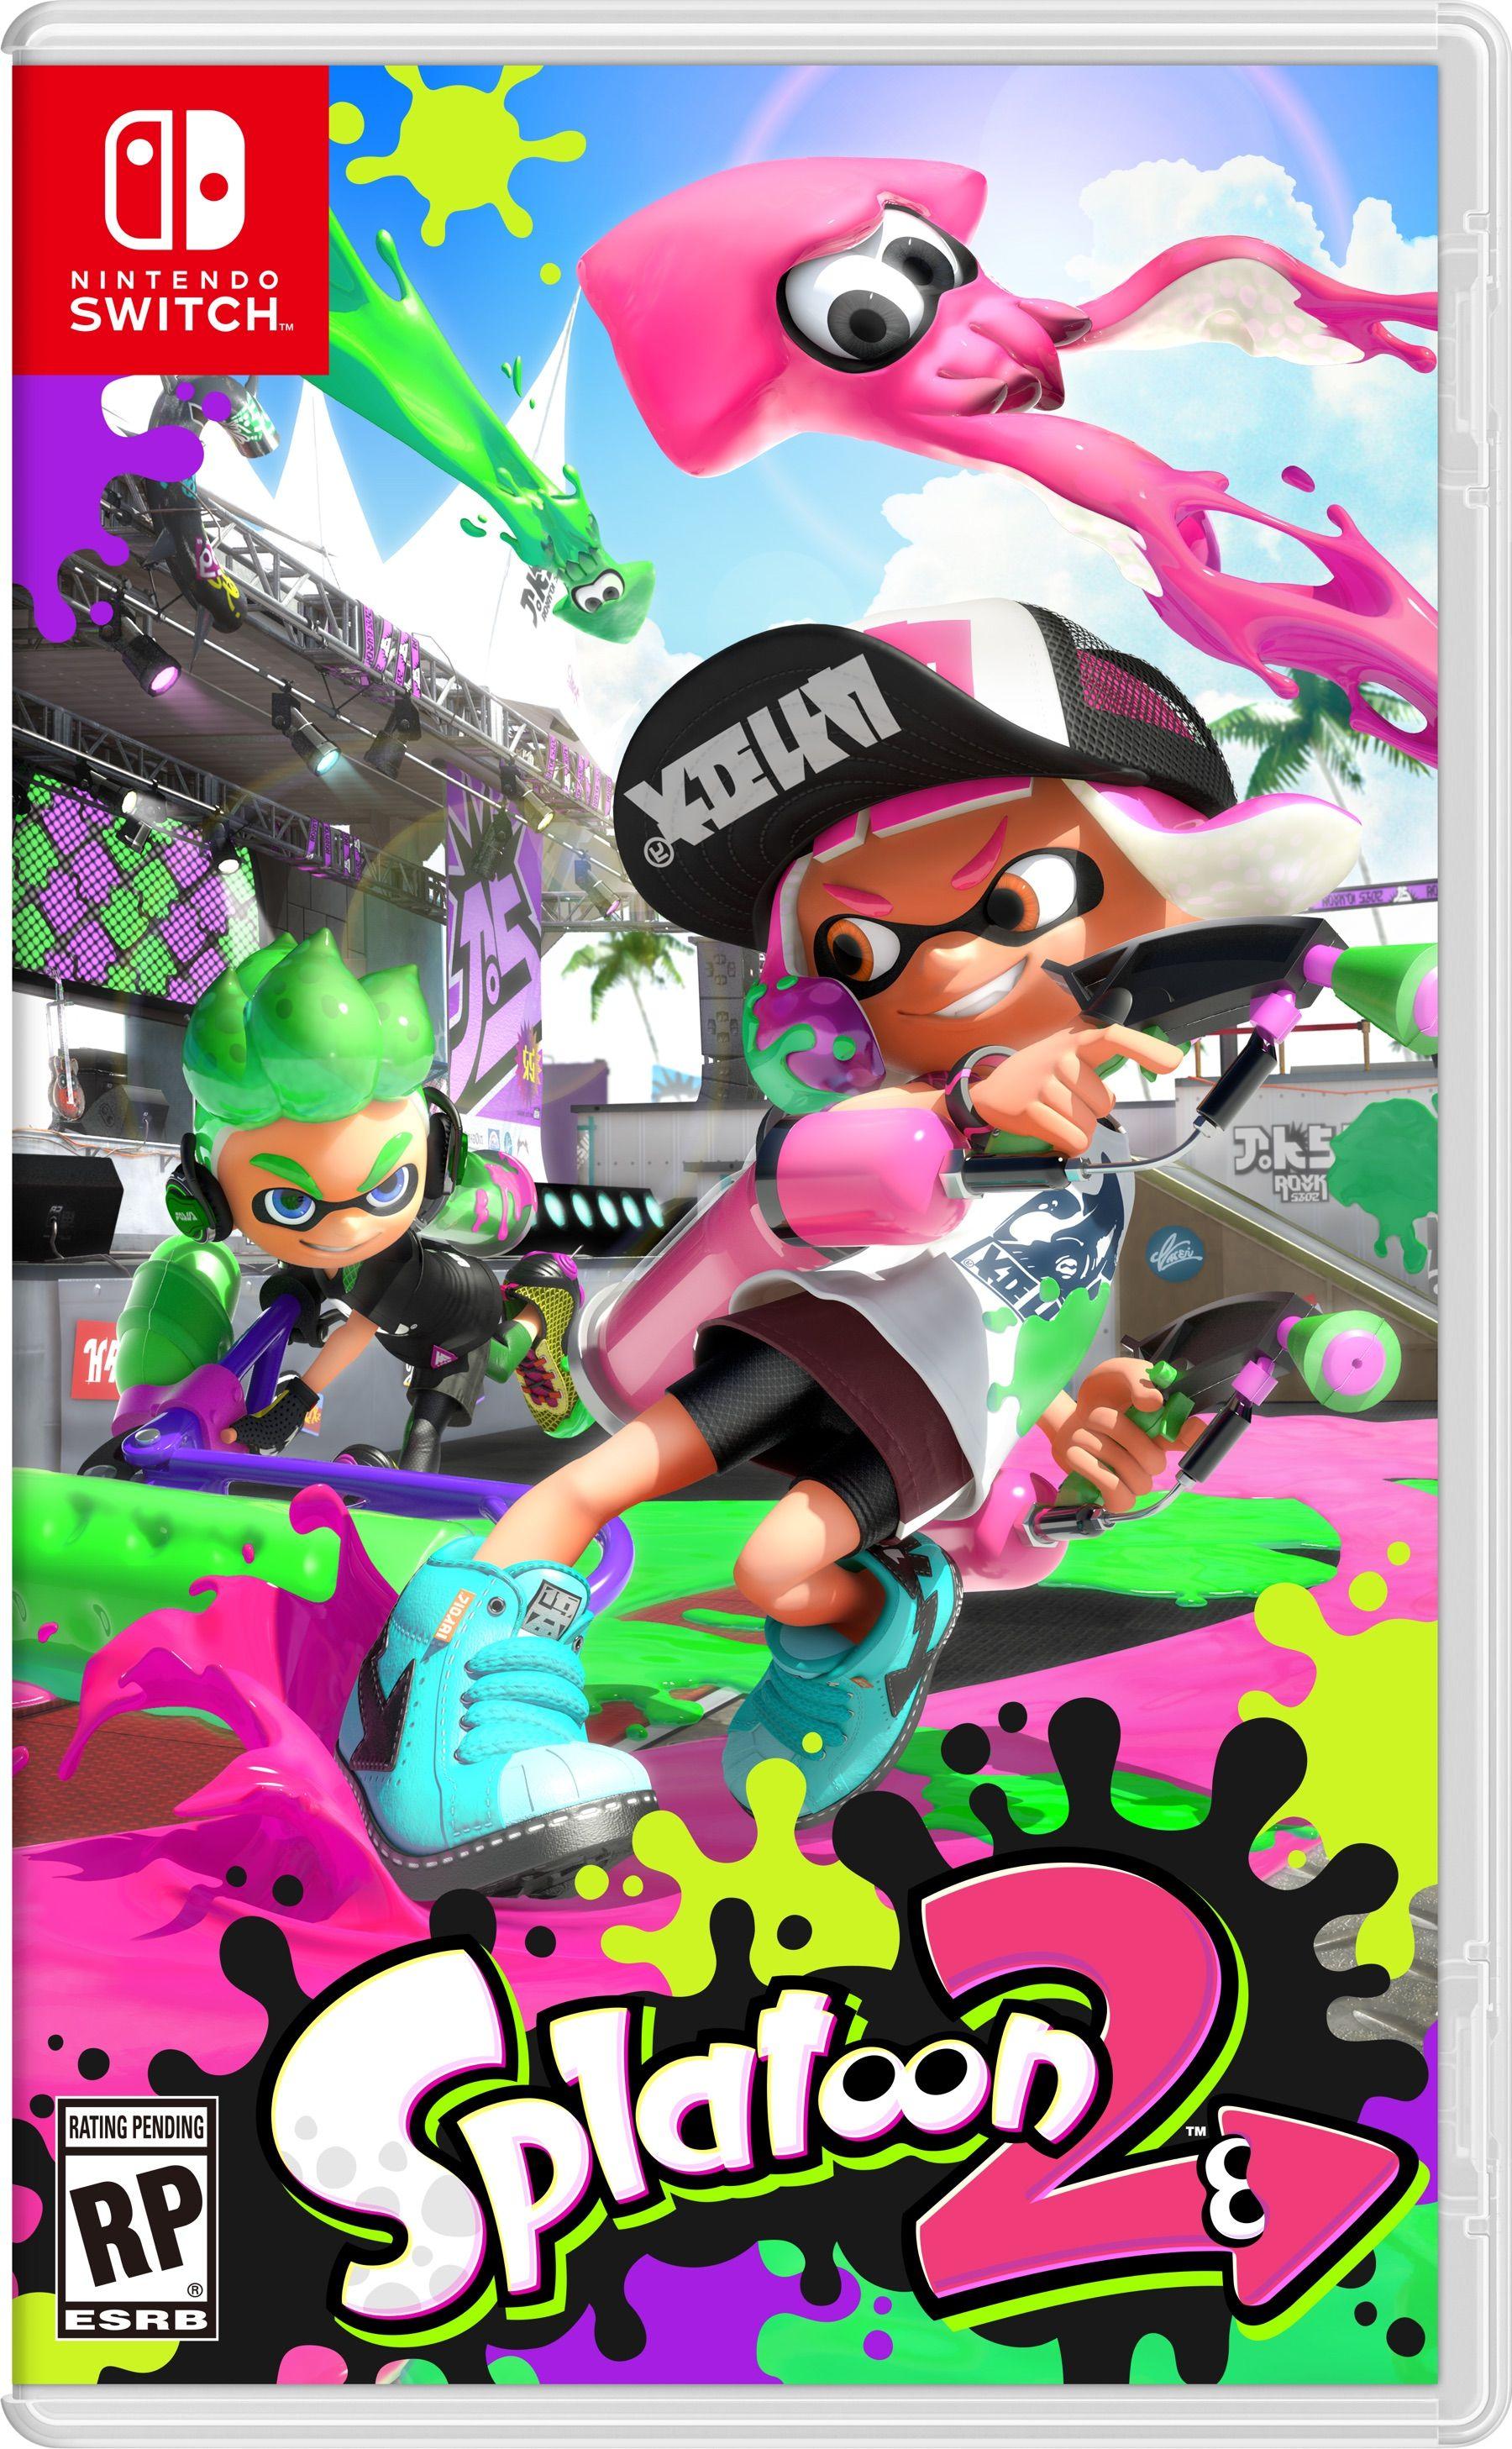 Splatoon 2 - Nintendo Switch | Nintendo Switch fun time | Nintendo